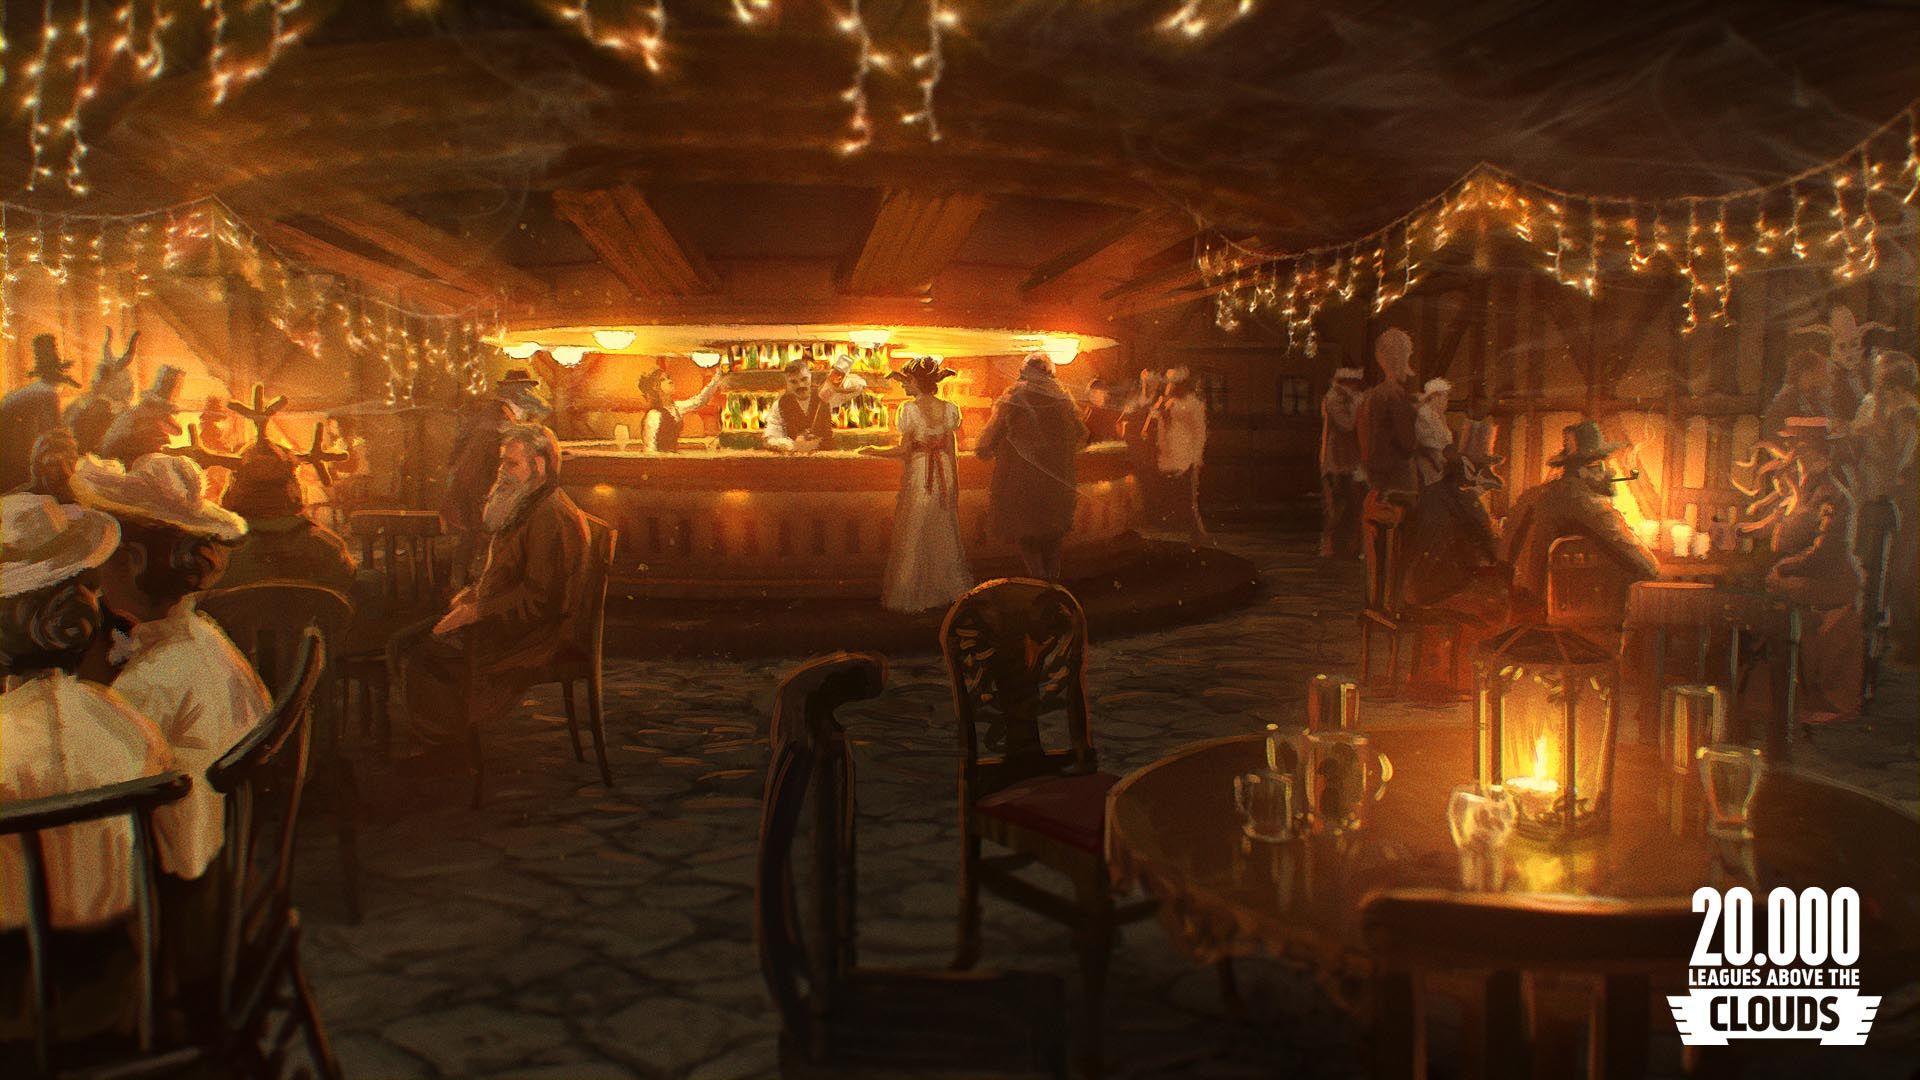 1399051699 5 Jpg 1920 1080 Episode Interactive Backgrounds Tavern Wallpaper